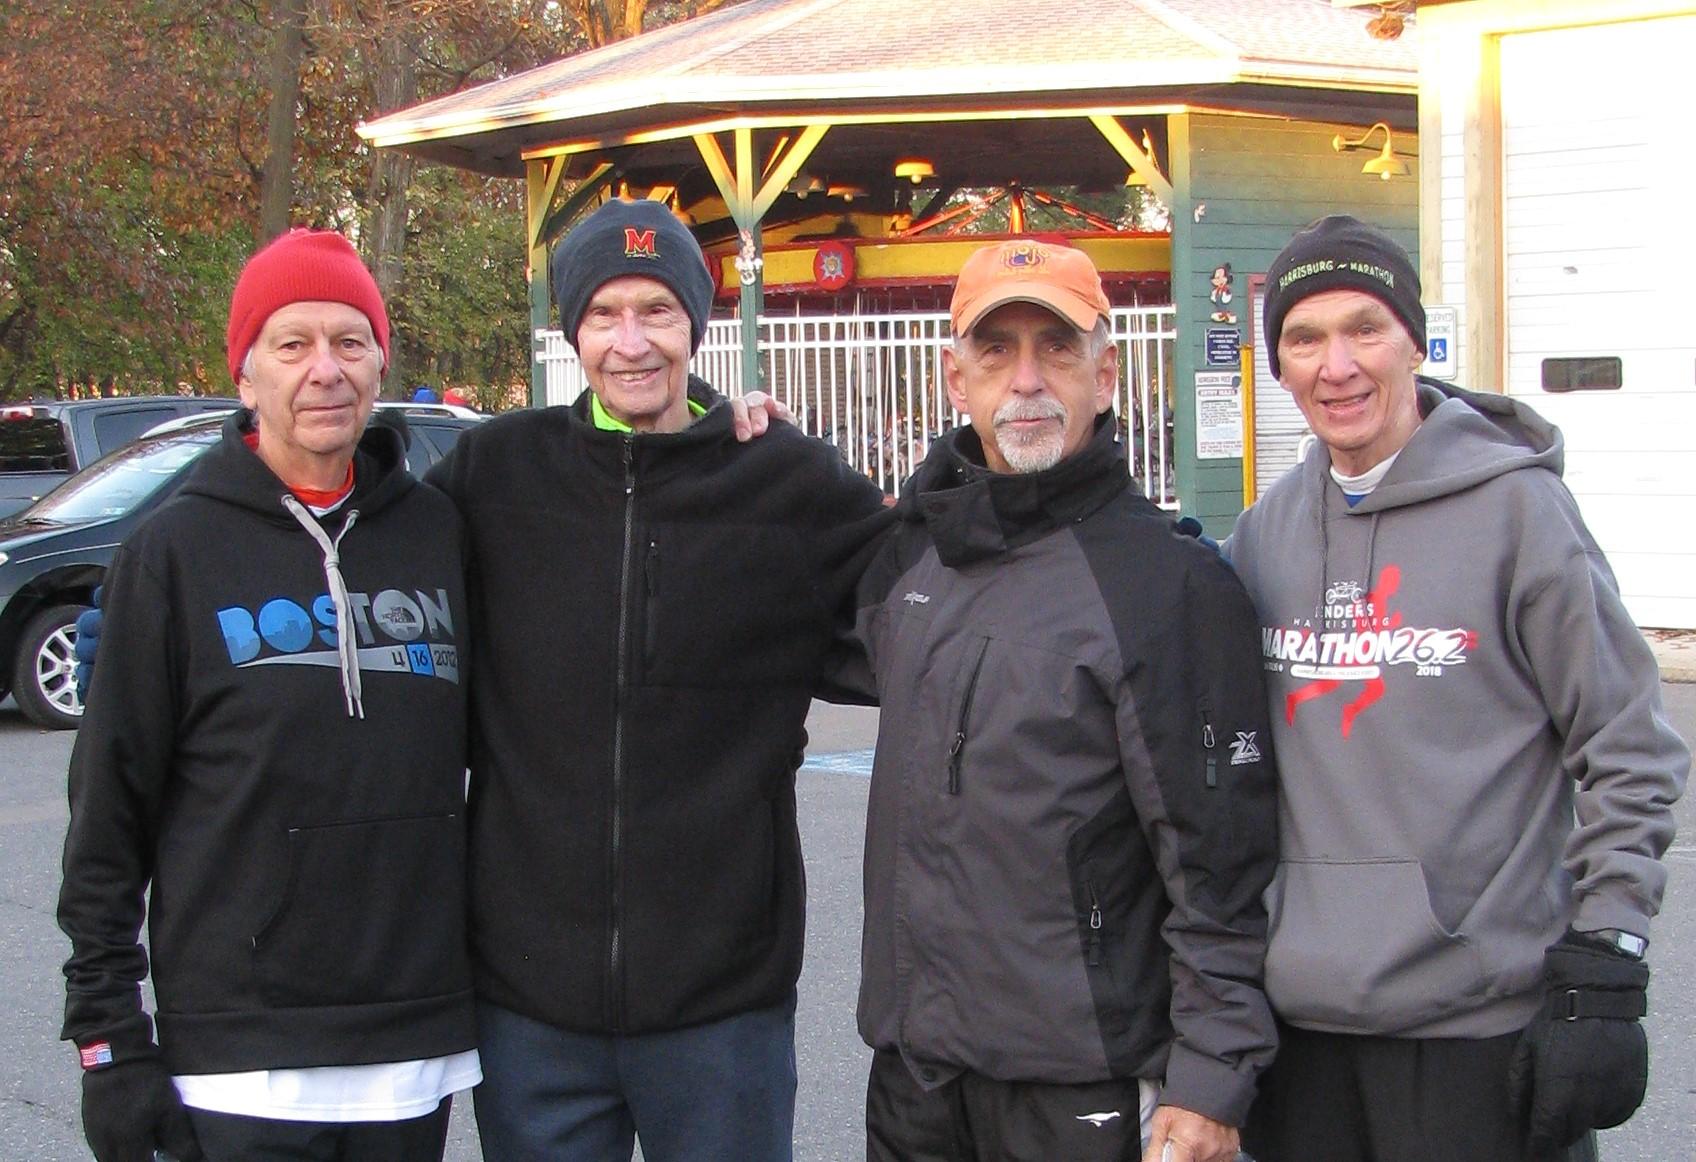 Tony Lee Jim & Brad Relay Hbg Marathon 18